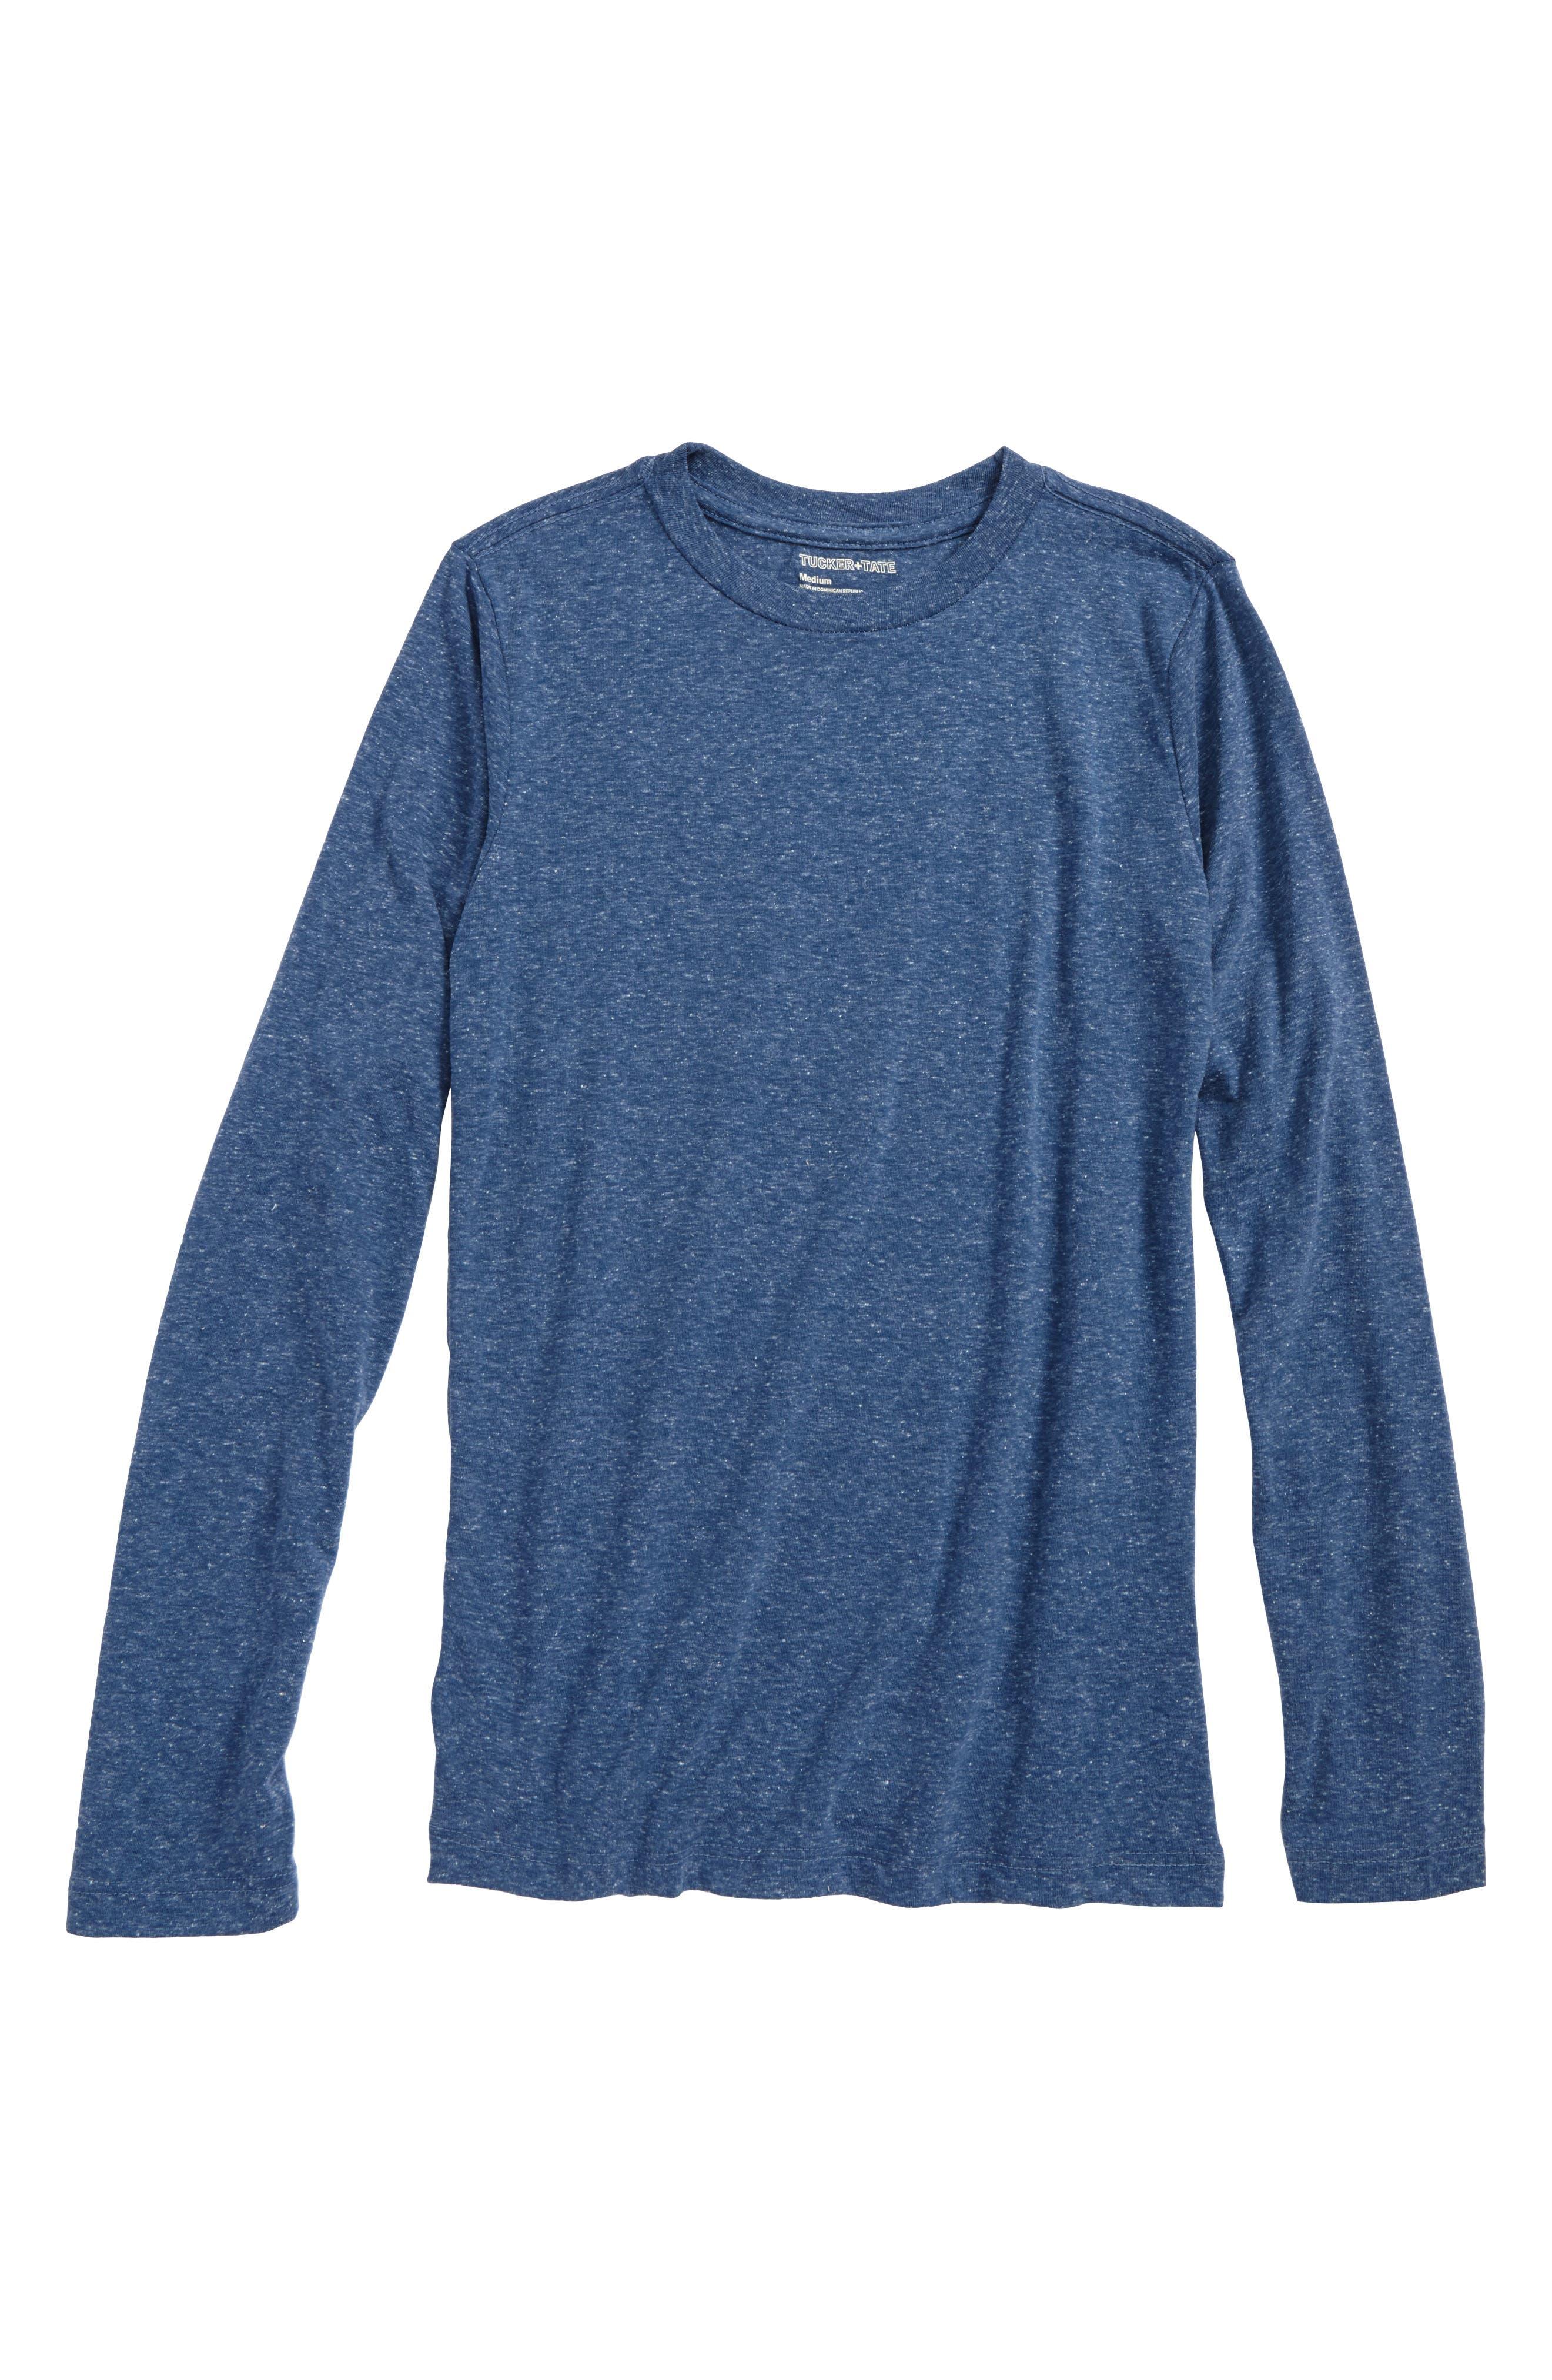 Alternate Image 1 Selected - Tucker + Tate Basic T-Shirt (Big Boys)